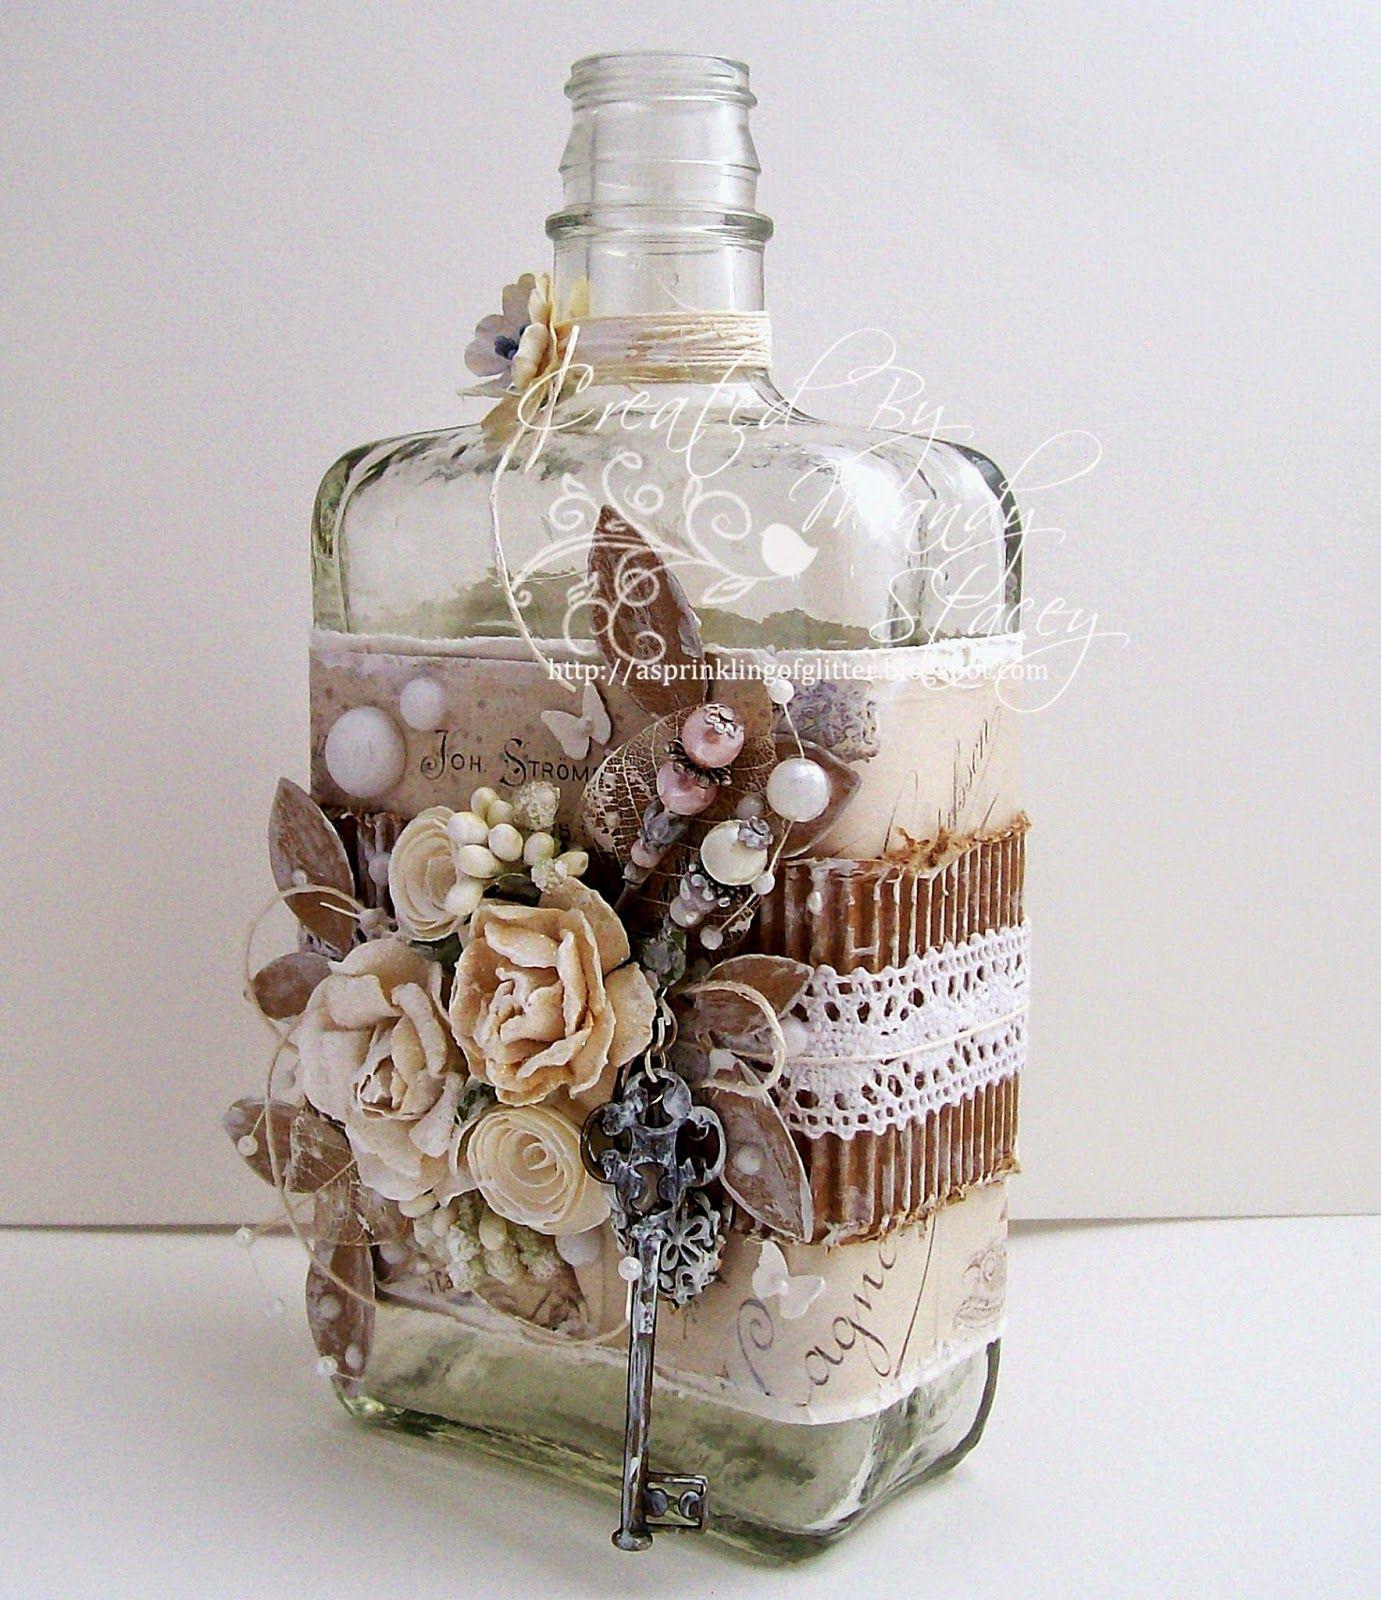 A sprinkling of glitter hedgehogs bottles simon says for Wine bottle crafts for sale